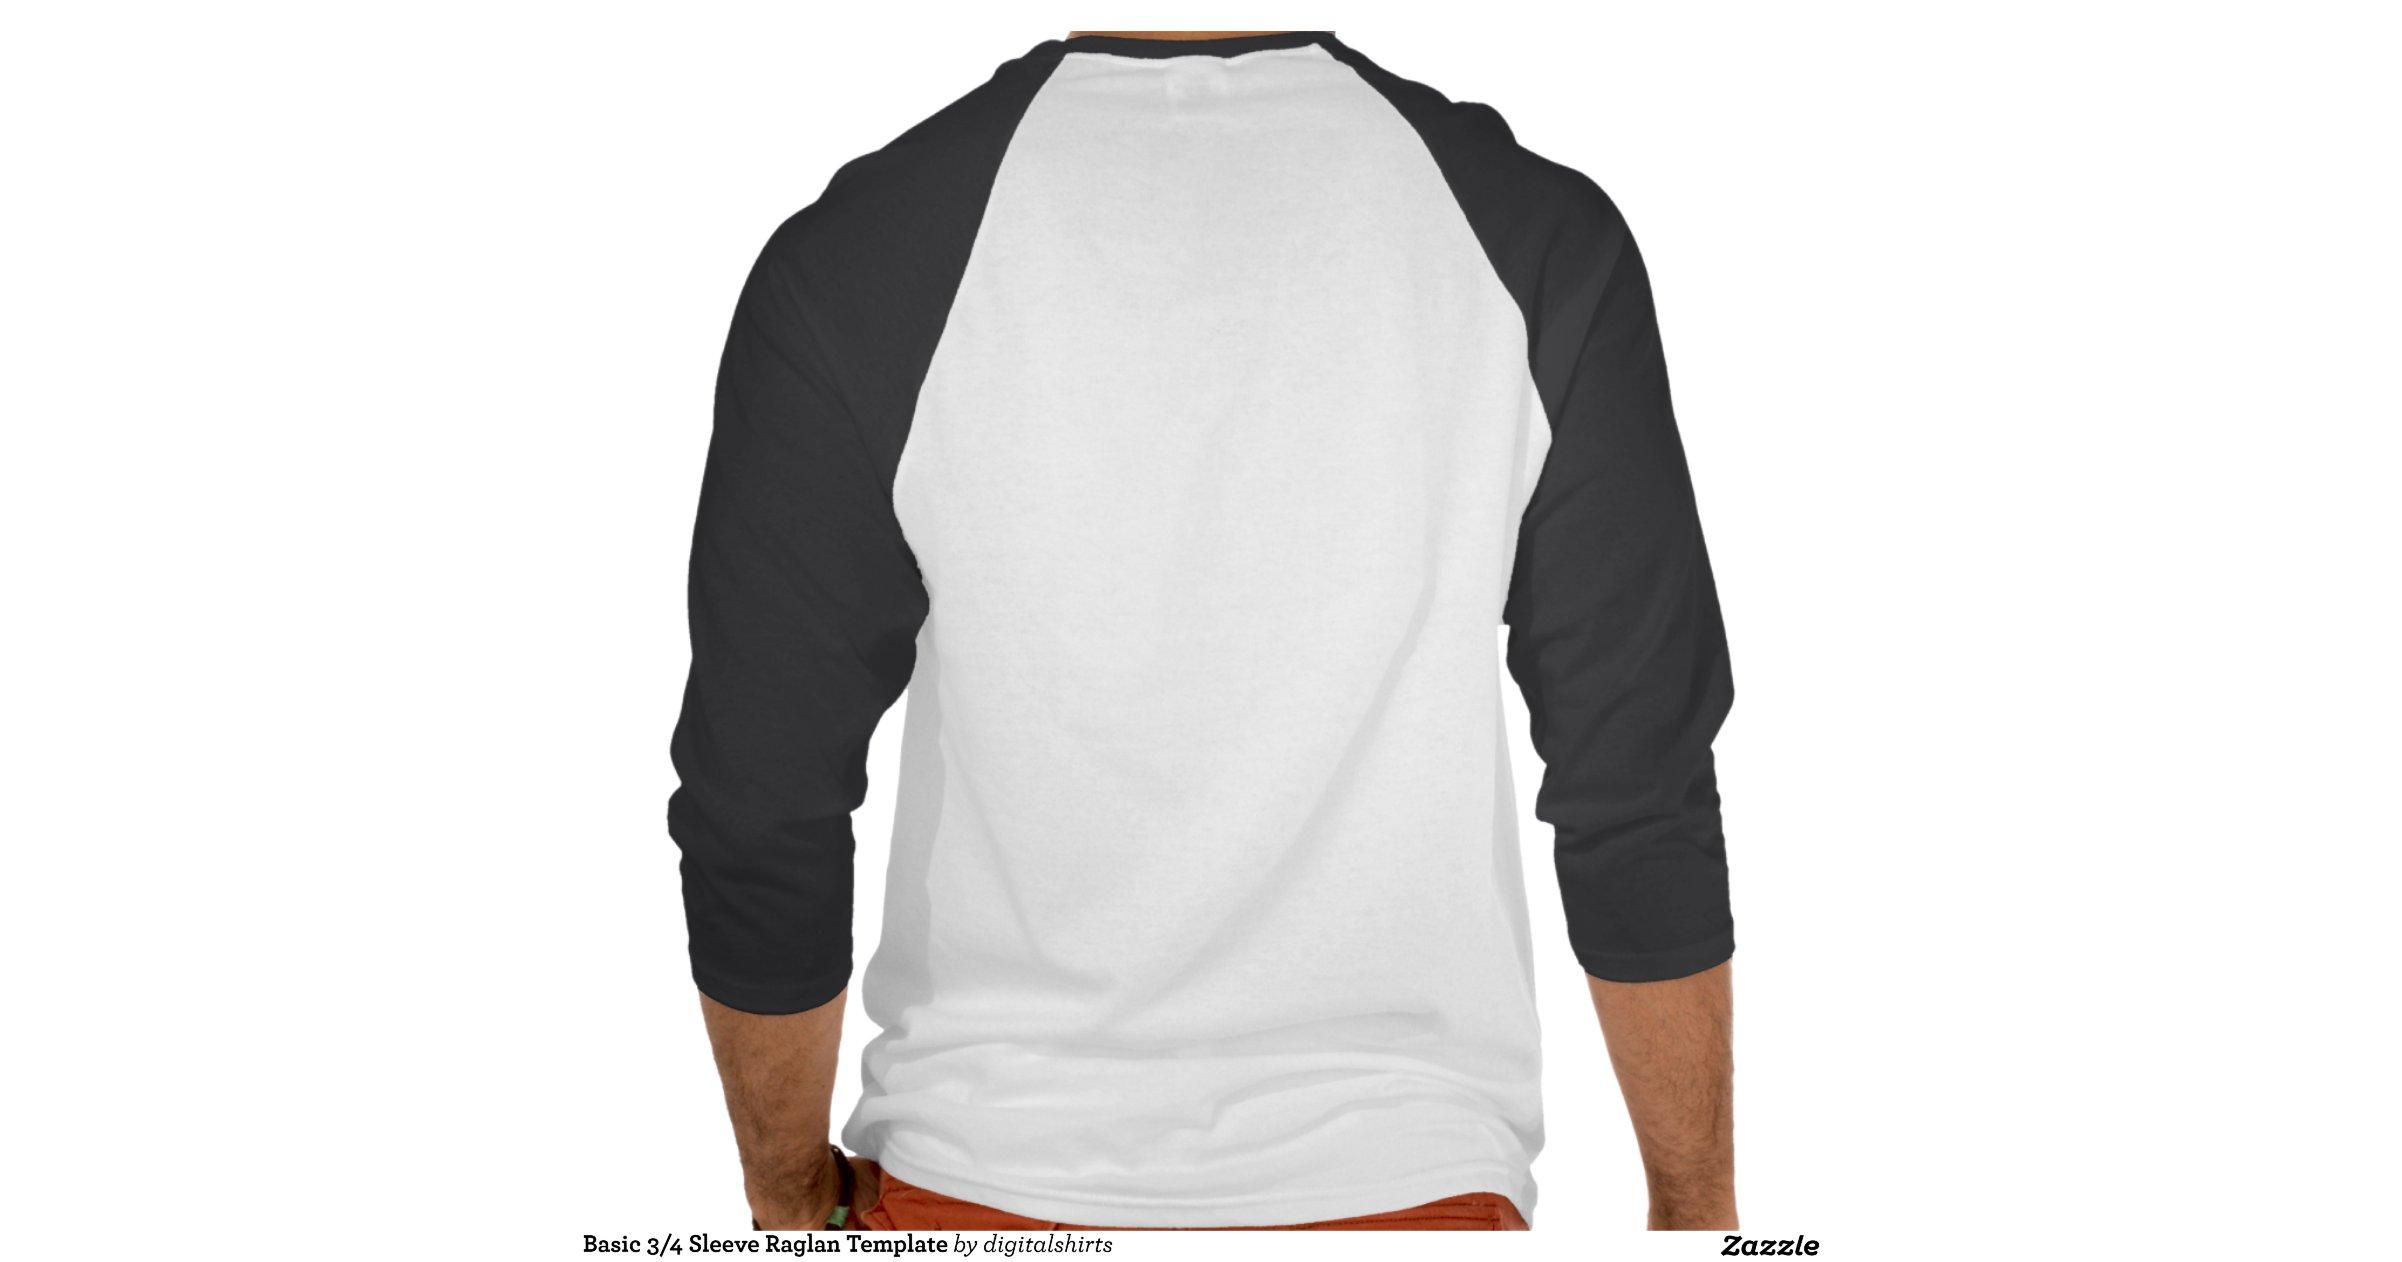 Basic 3 4 sleeve raglan template t shirt zazzle for 3 4 sleeve shirt template